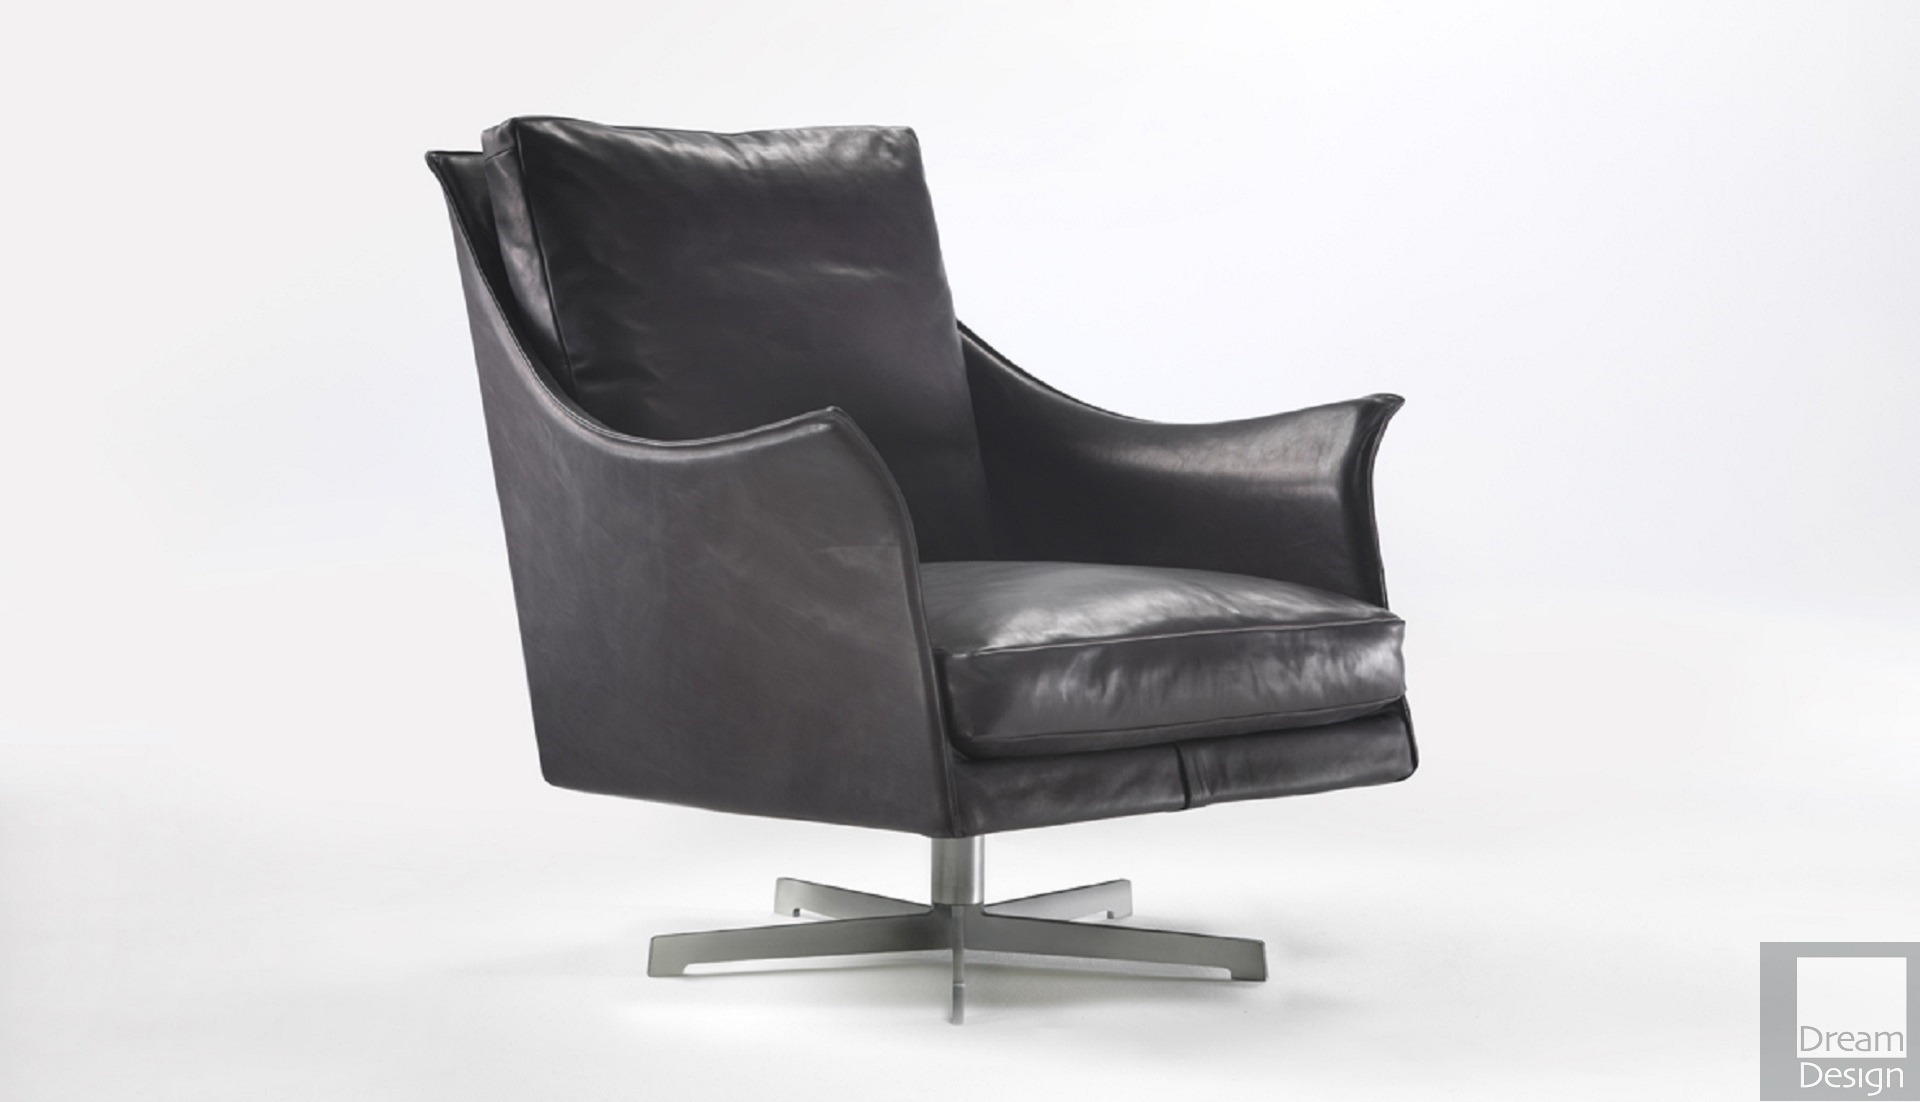 flexform boss swivel chair dream design interiors ltd. Black Bedroom Furniture Sets. Home Design Ideas